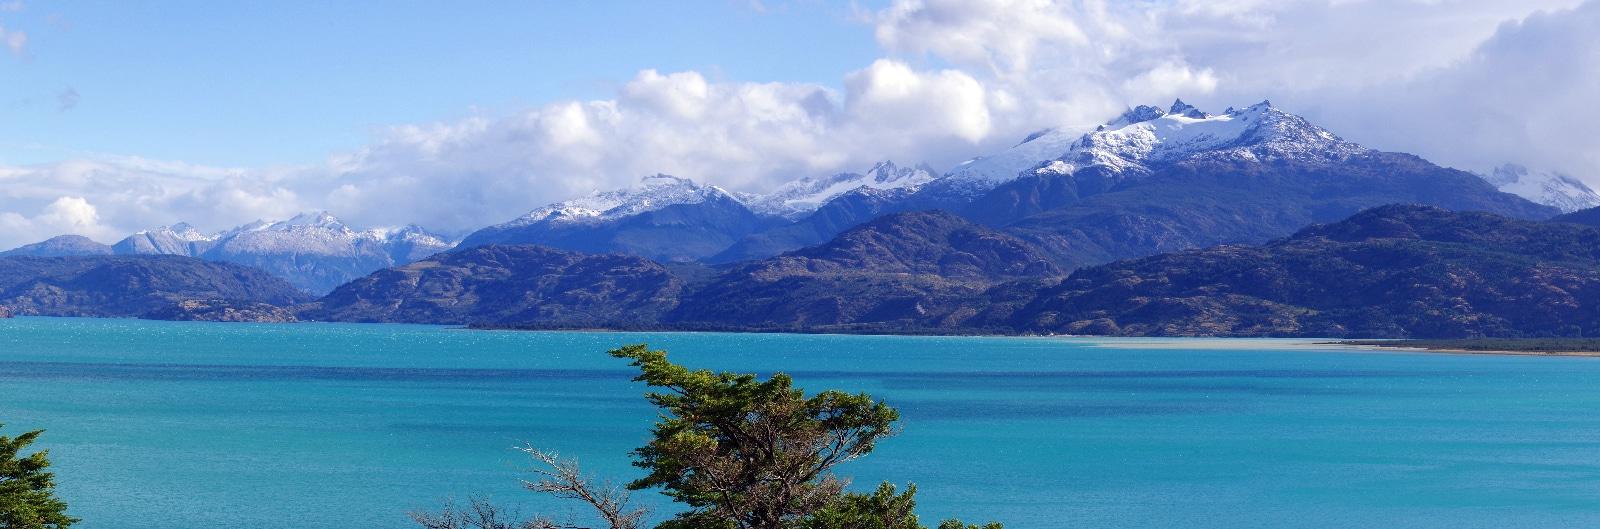 Le Lago General Carrera toujours aussi splendide.